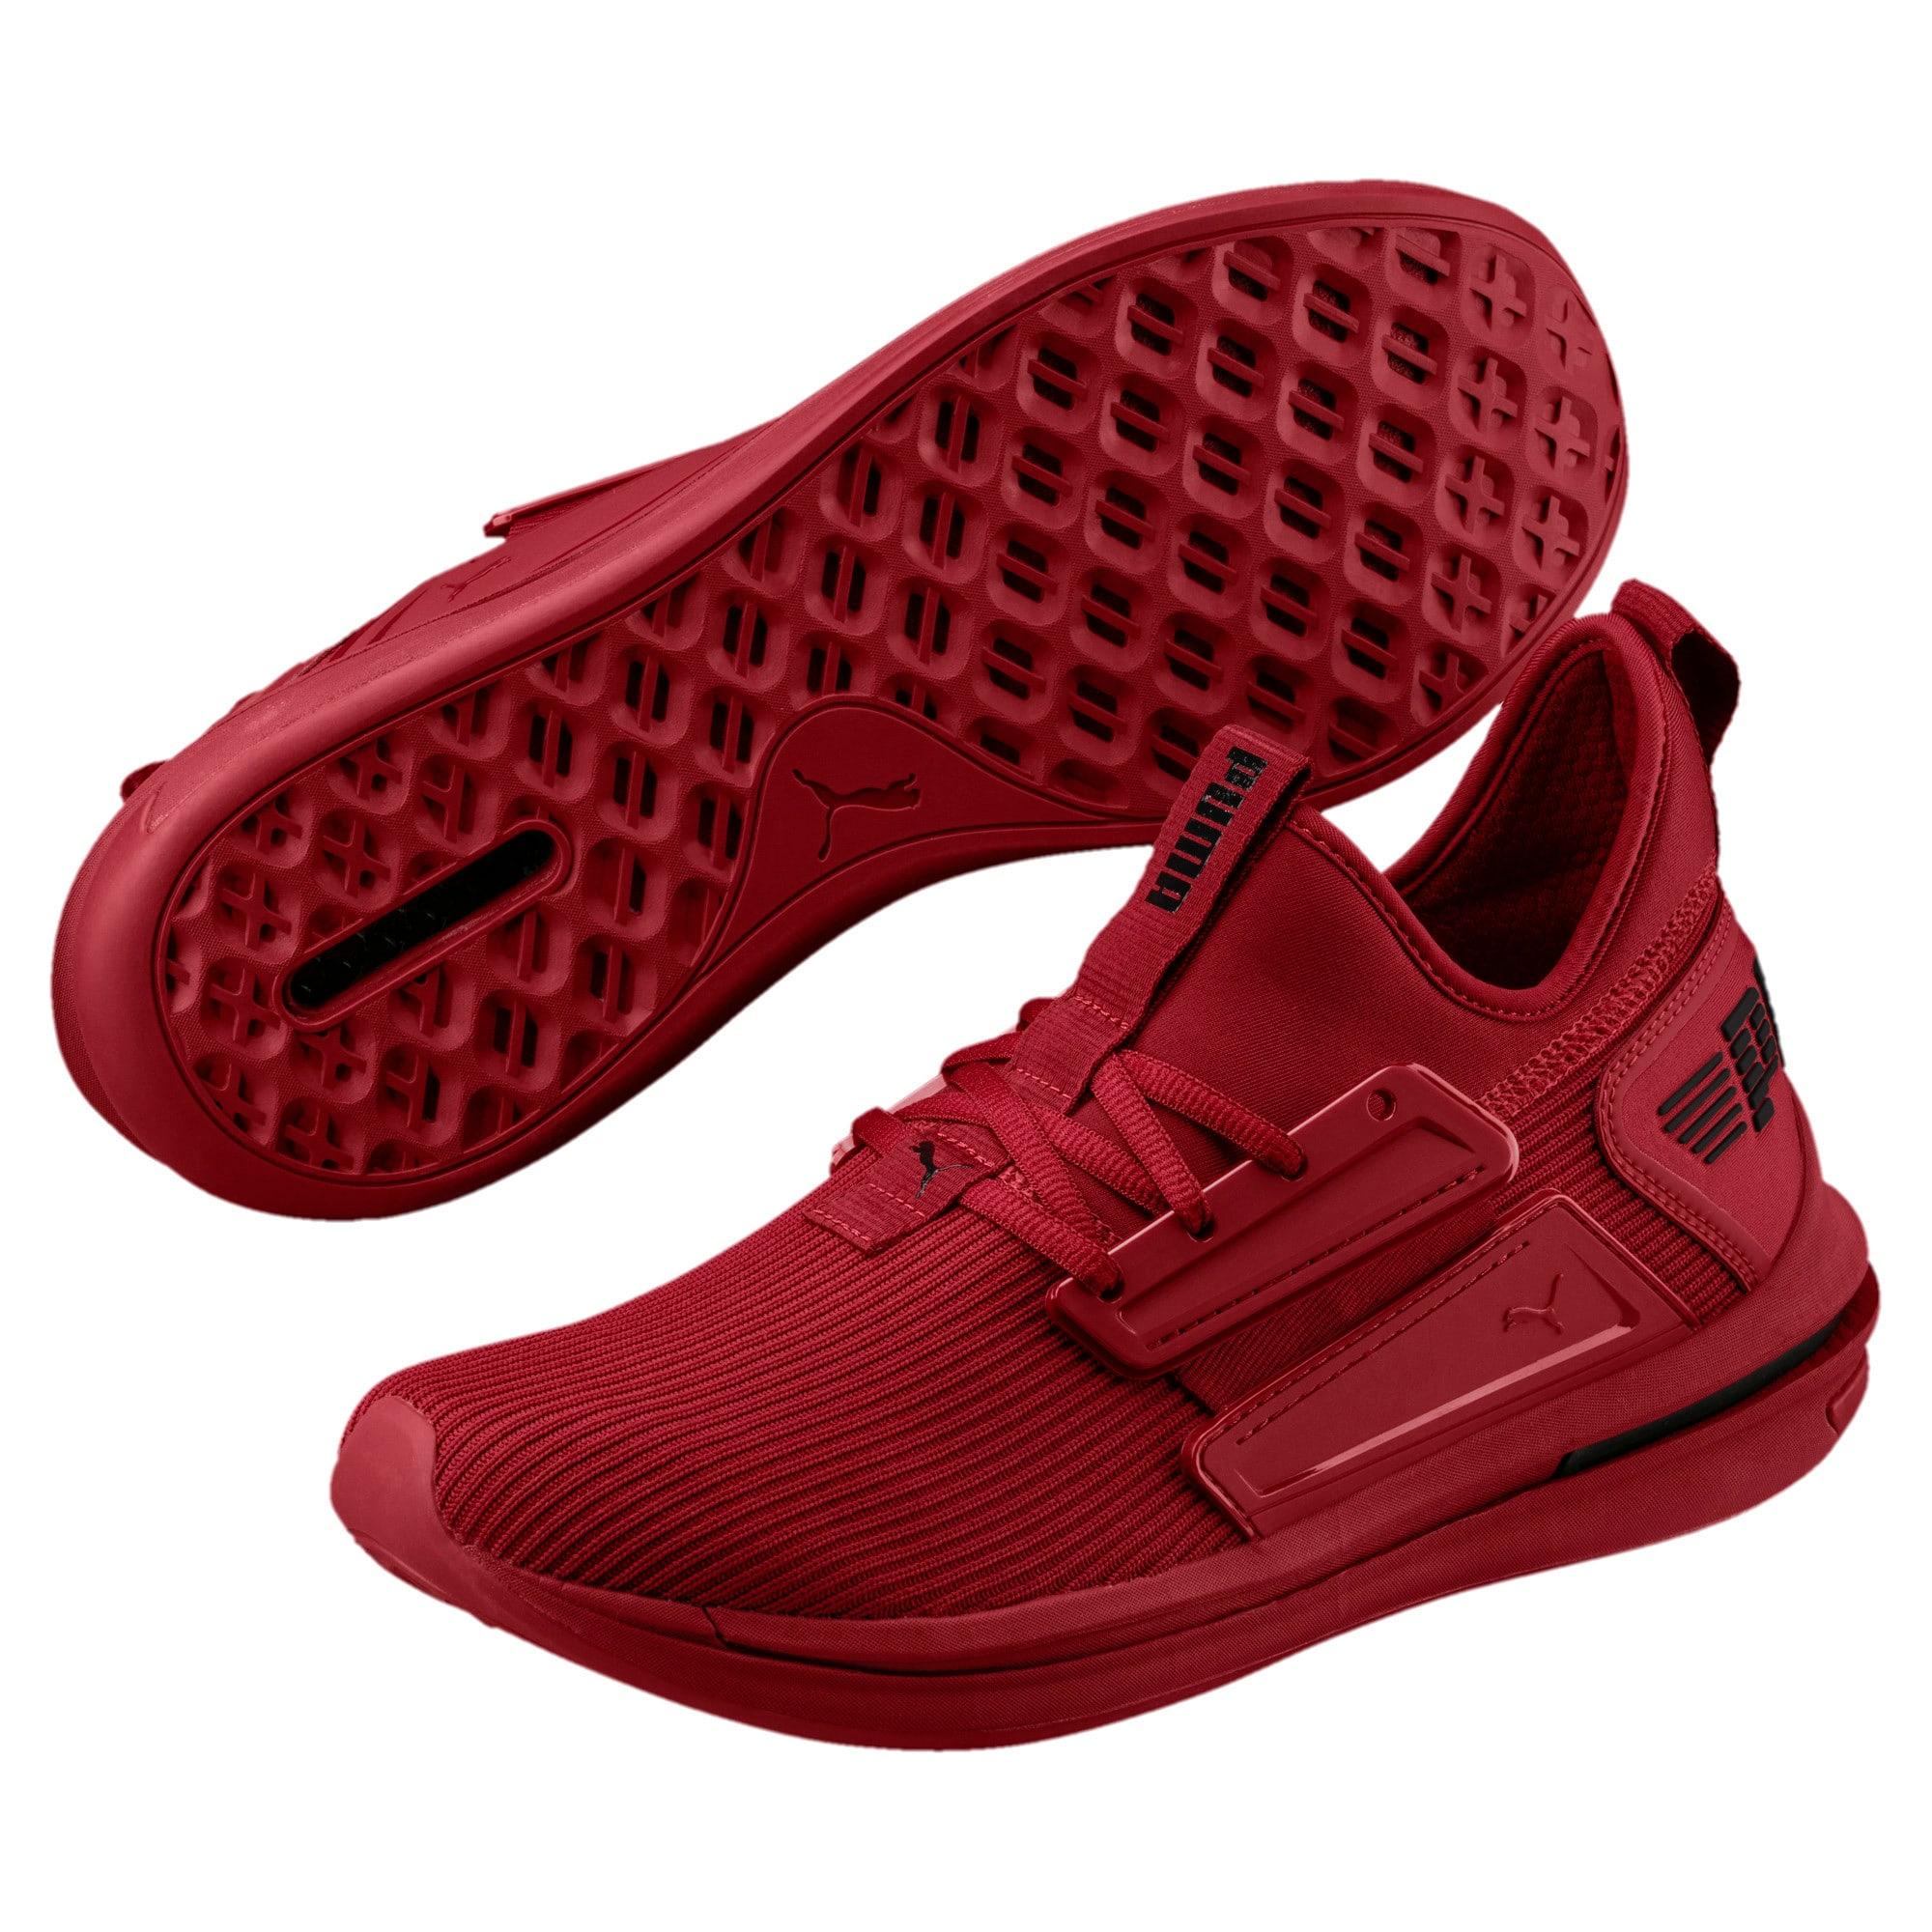 Thumbnail 2 of IGNITE Limitless SR Men's Running Shoes, Red Dahlia, medium